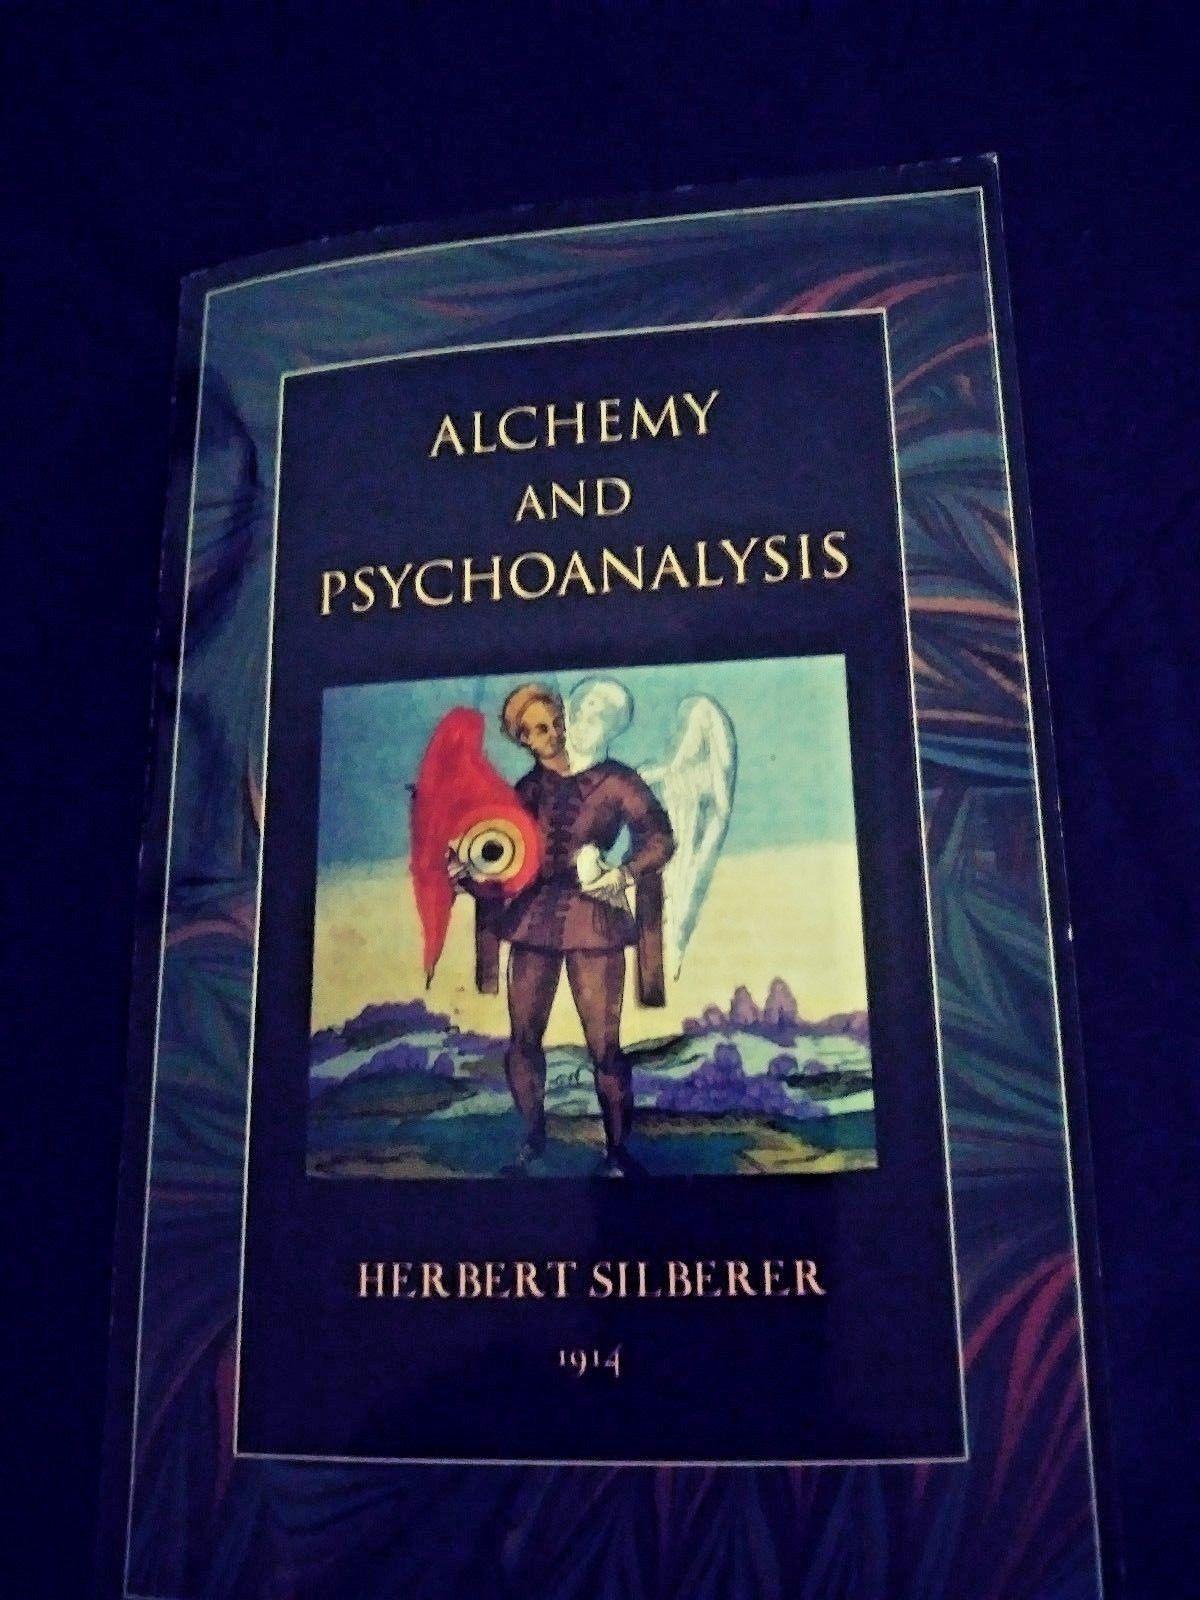 My eBay Active Reading, Ebay, Books